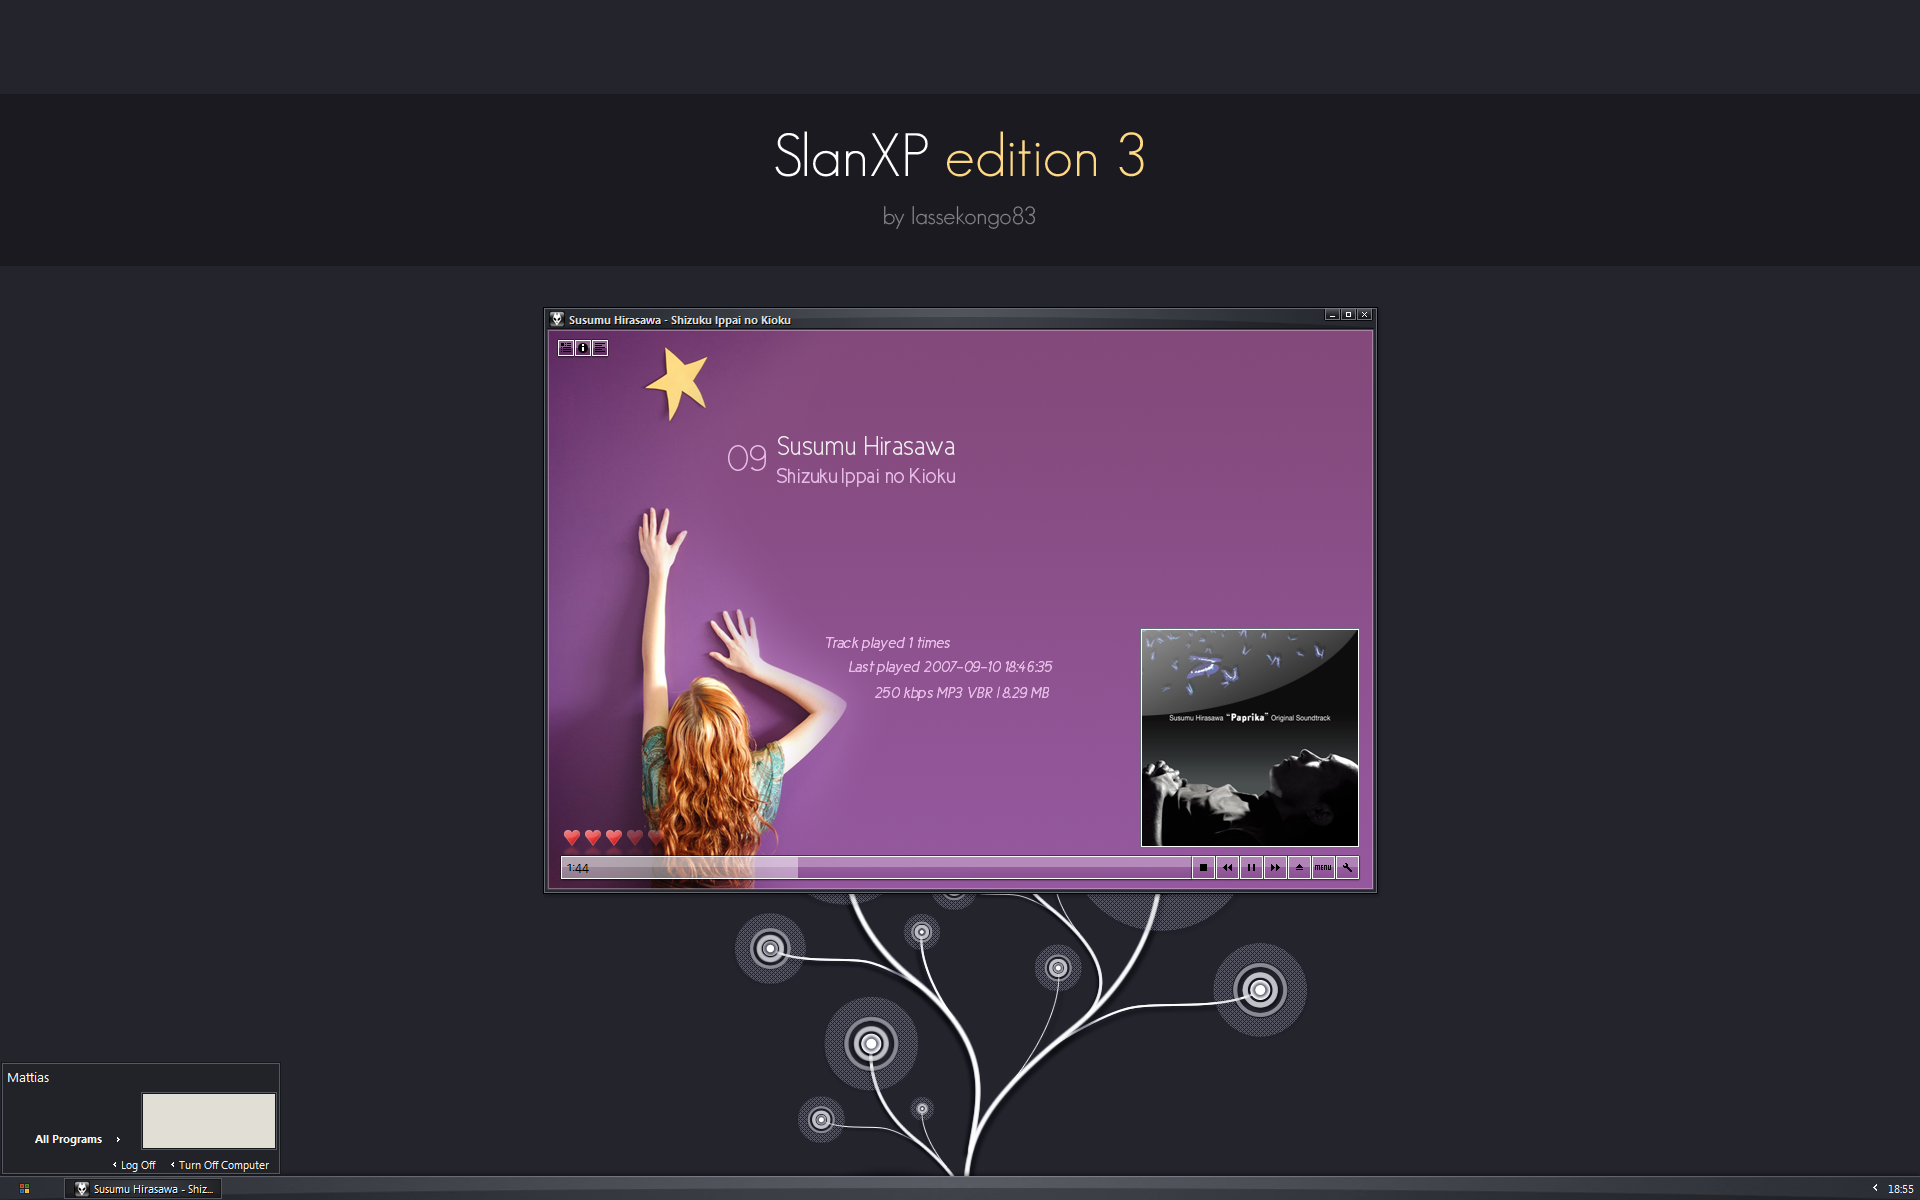 SlanXP Edition 3 by lassekongo83